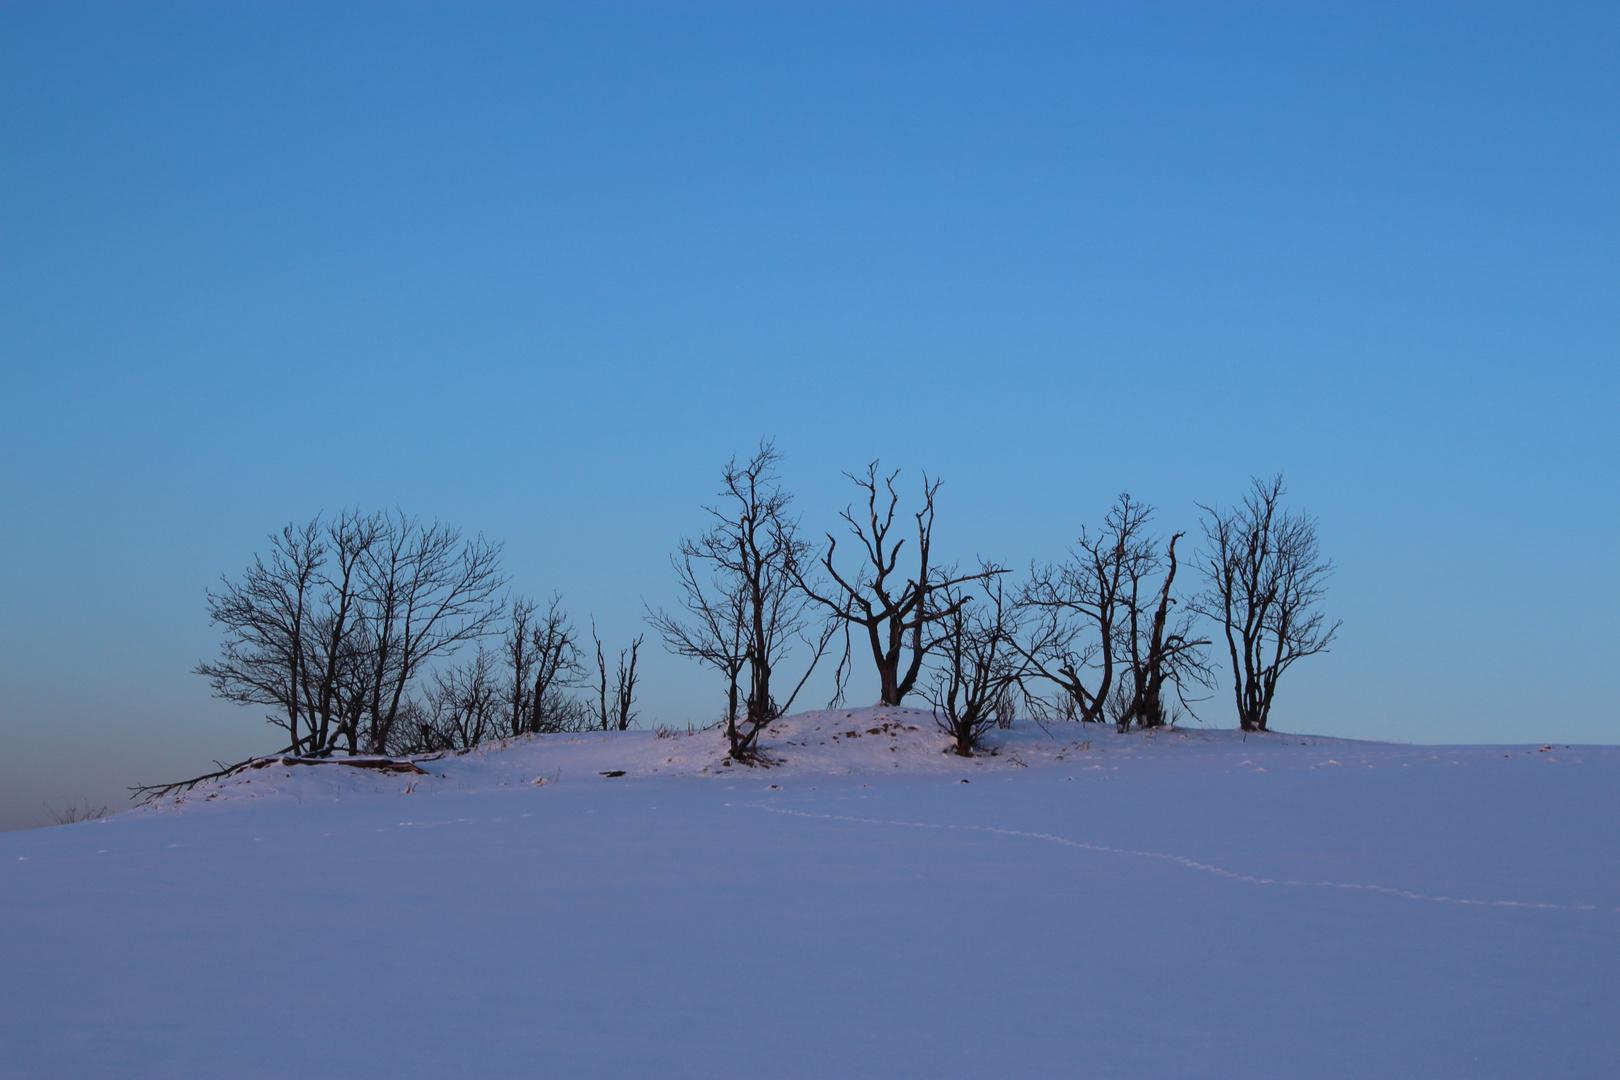 Winter im Erzgebirge Kühnheide